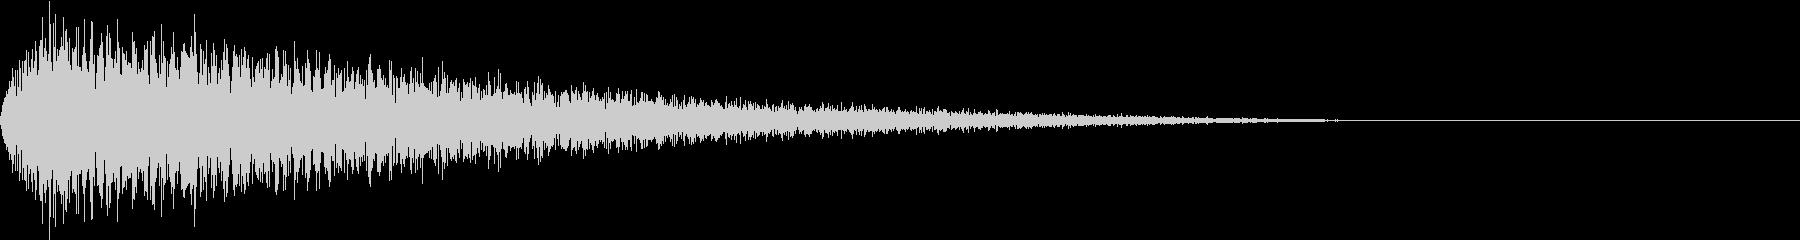 DTM Snare 10 オリジナル音源の未再生の波形